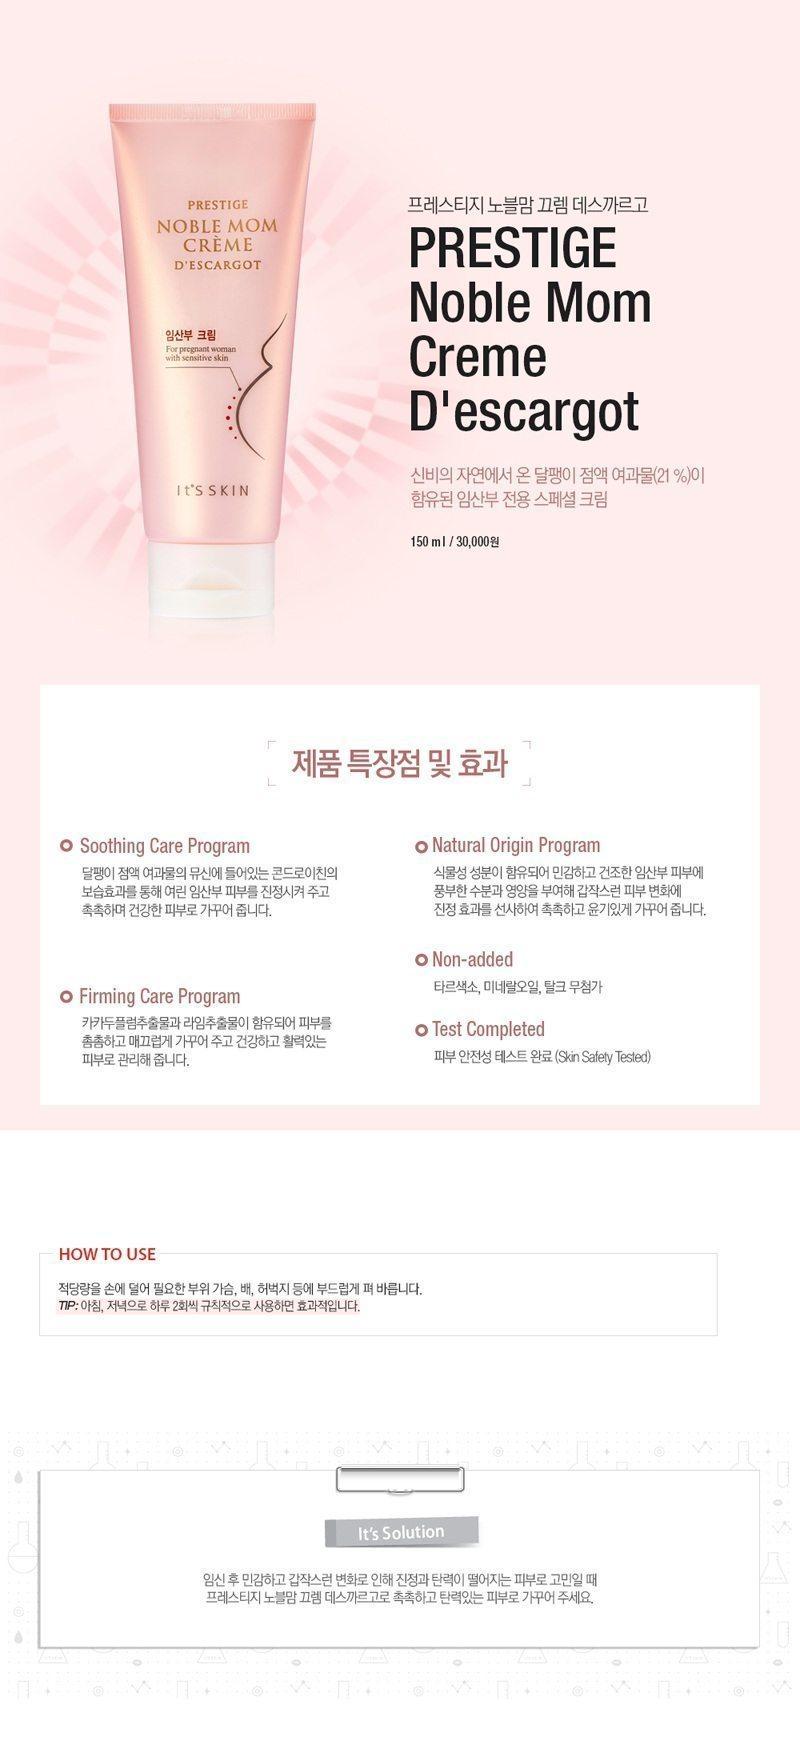 It's Skin Prestige Noble Mom Crème D'escargot korean cosmetic skincare product online shop malaysia brazil macau1